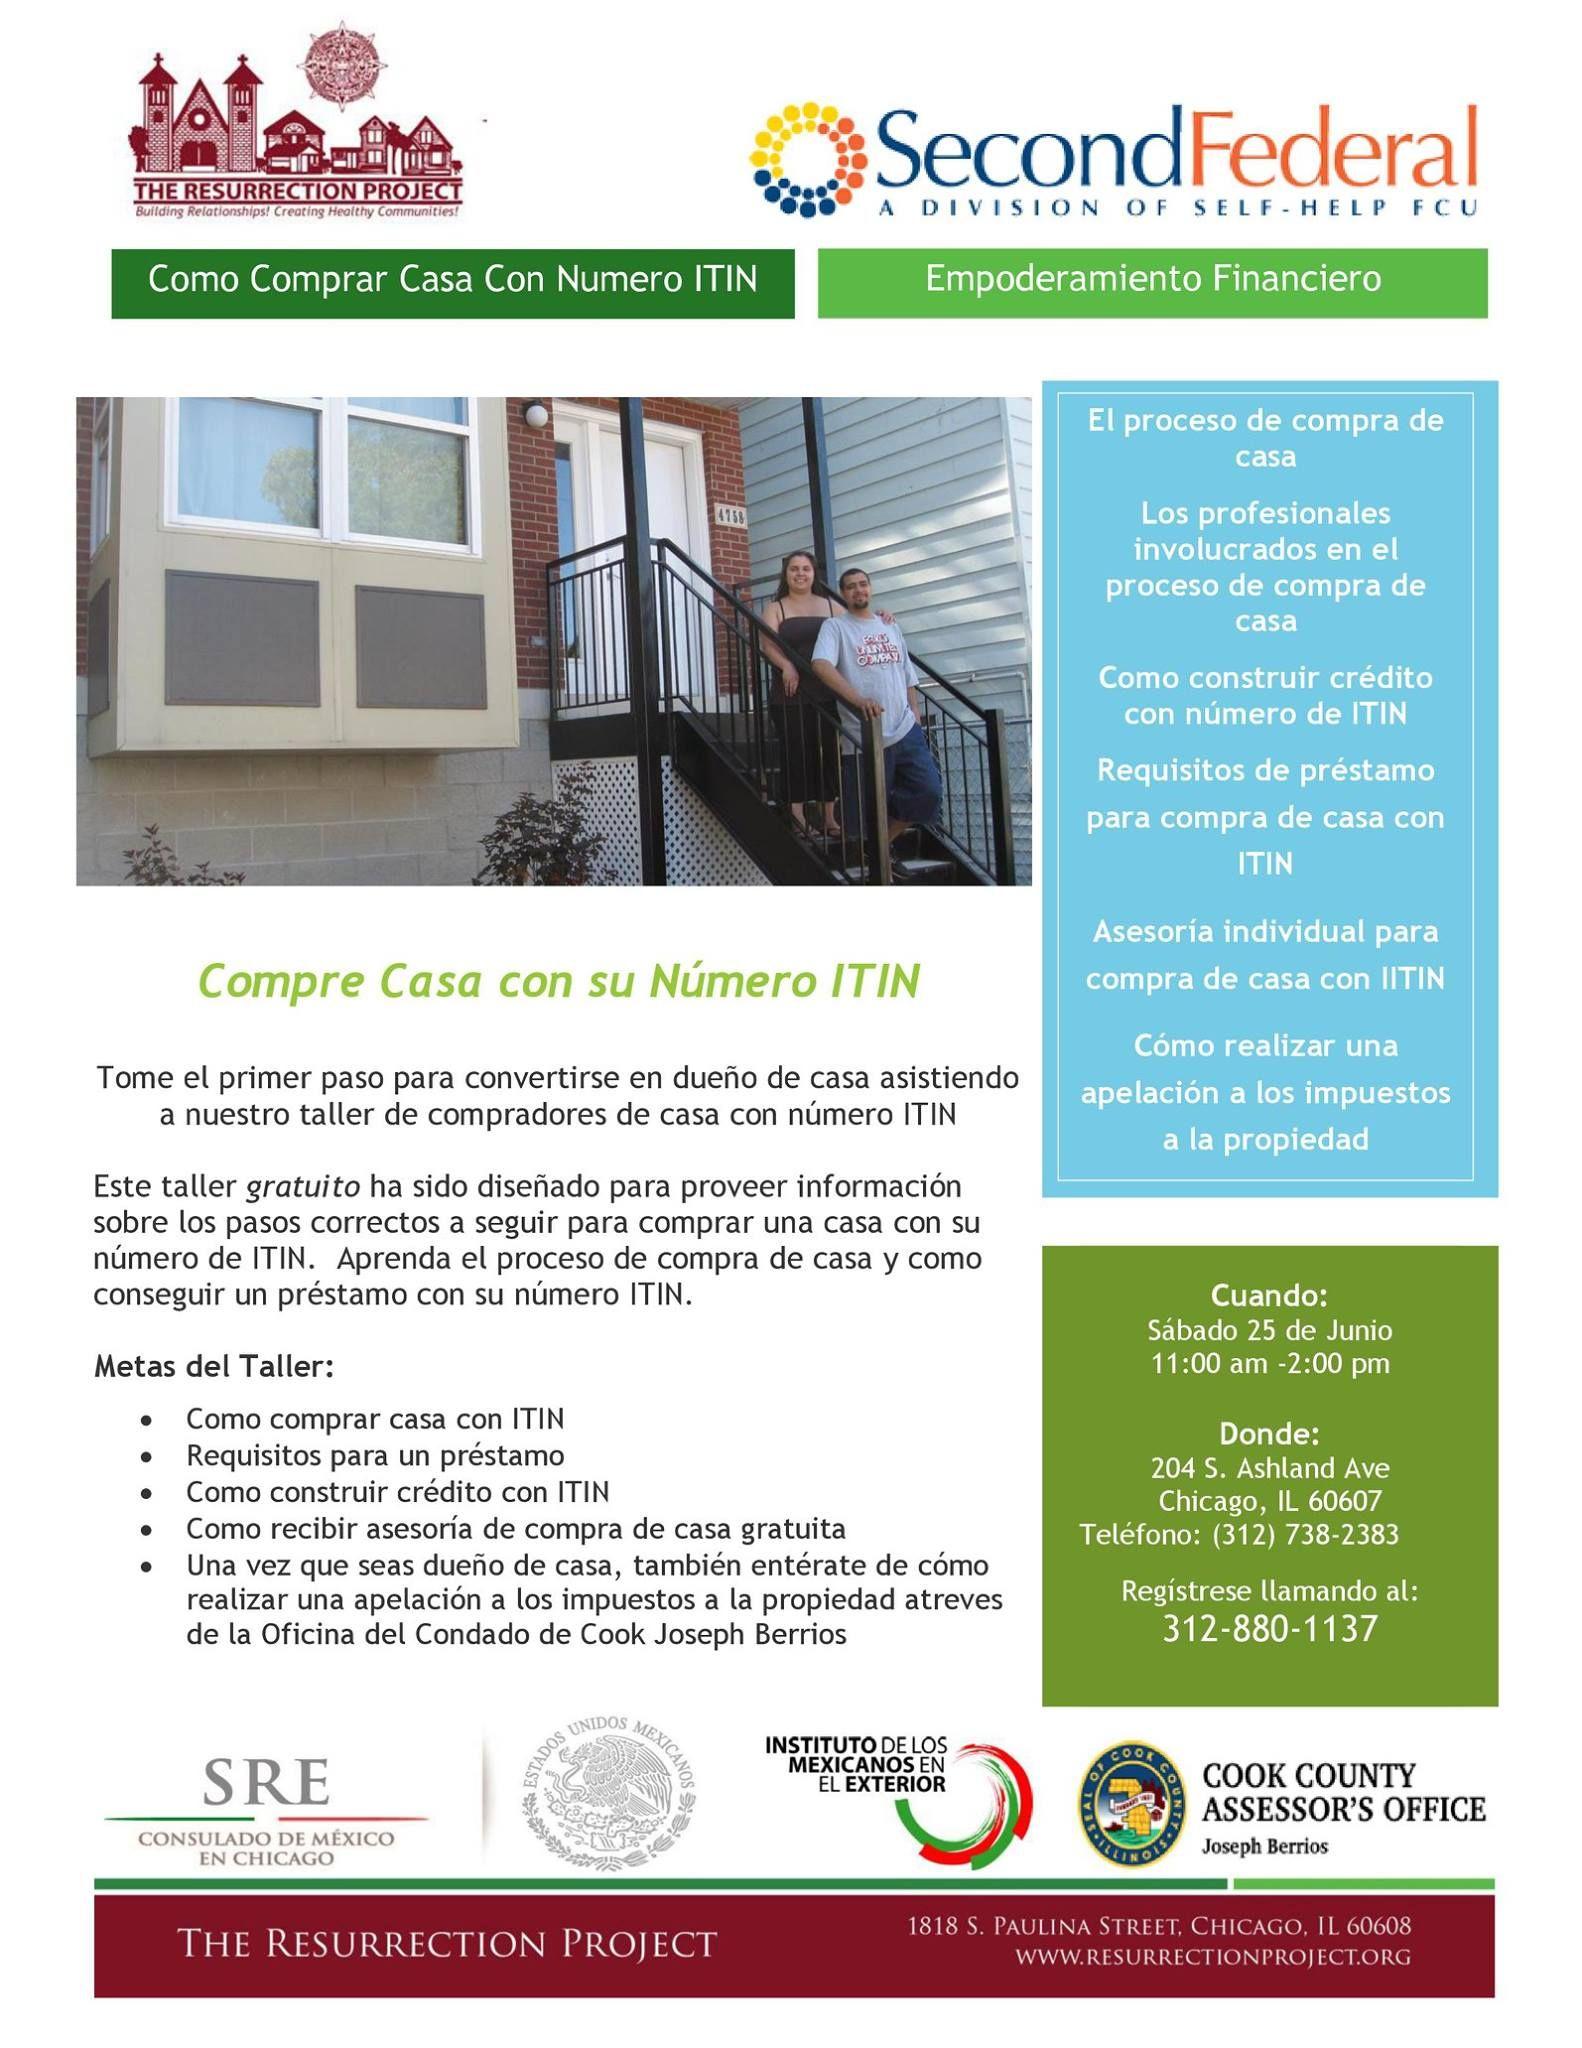 9df7ab9b27a75 6 25 - Quiere Comprar Casa Con Numero ITIN  Nuevo taller para comprar casa.